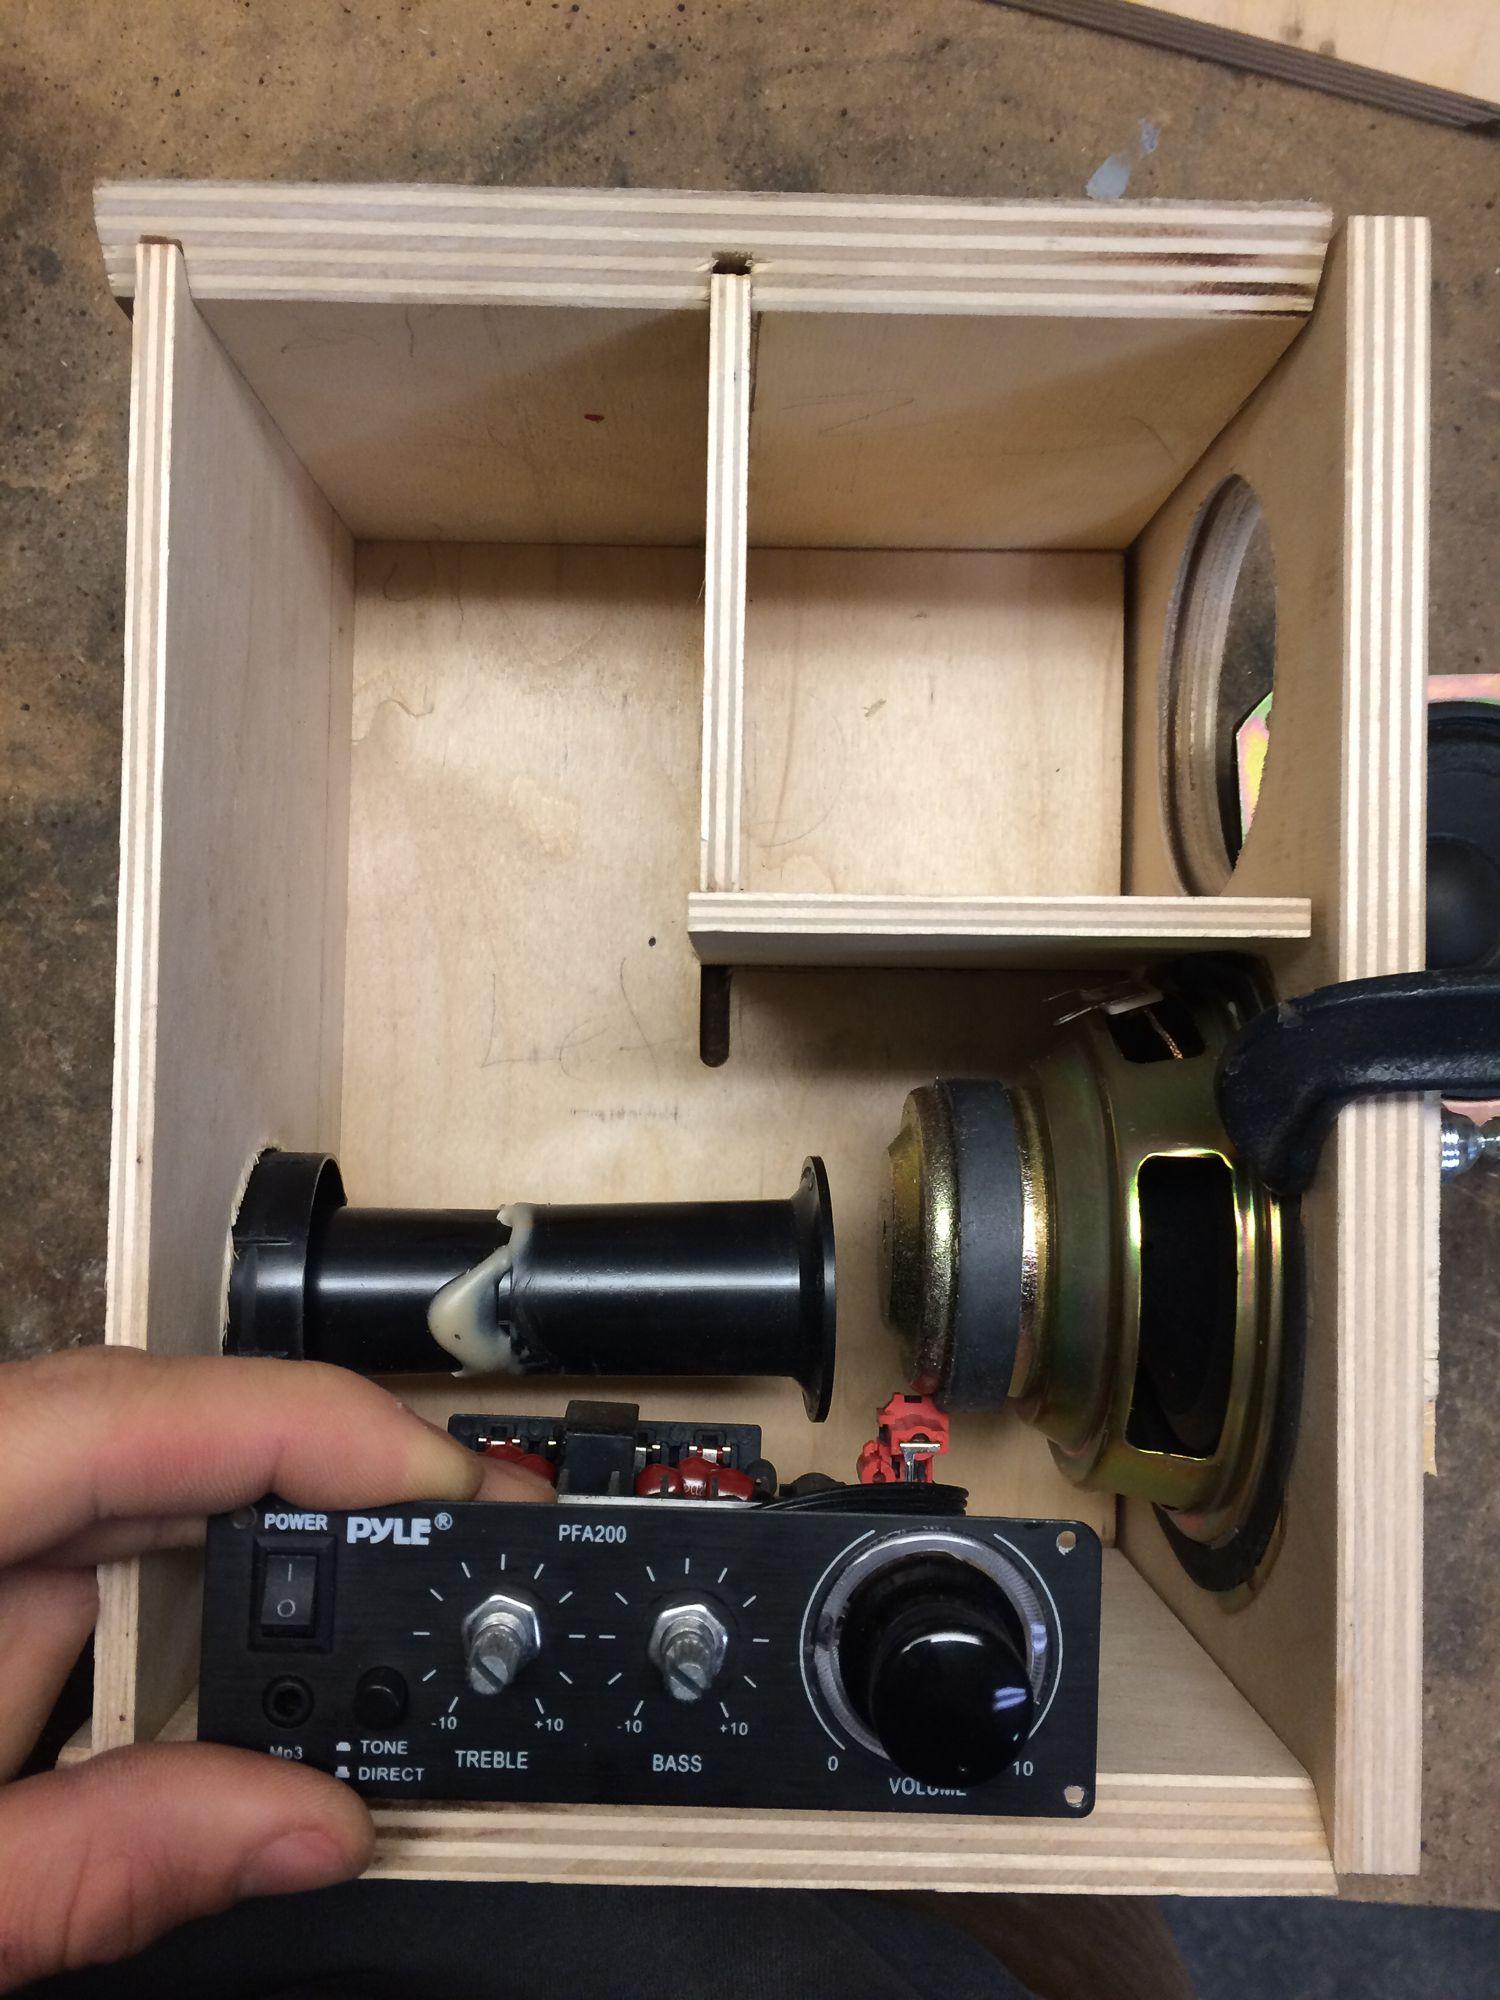 Bookshelf Speakers Bluetooth Enabled & Baltic Birch in